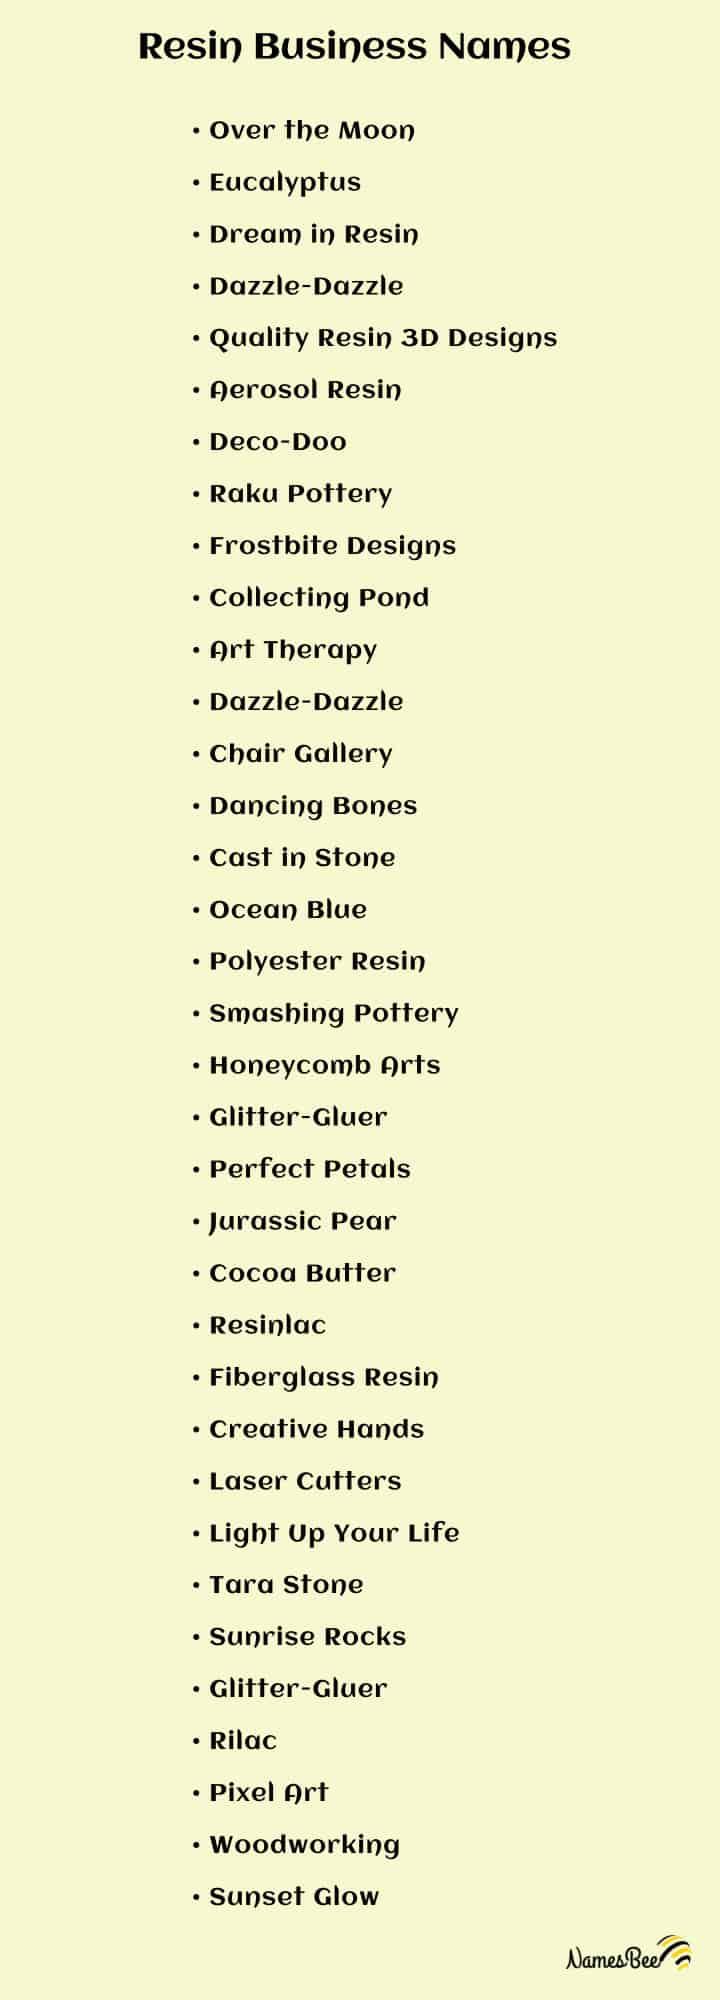 resin business names list